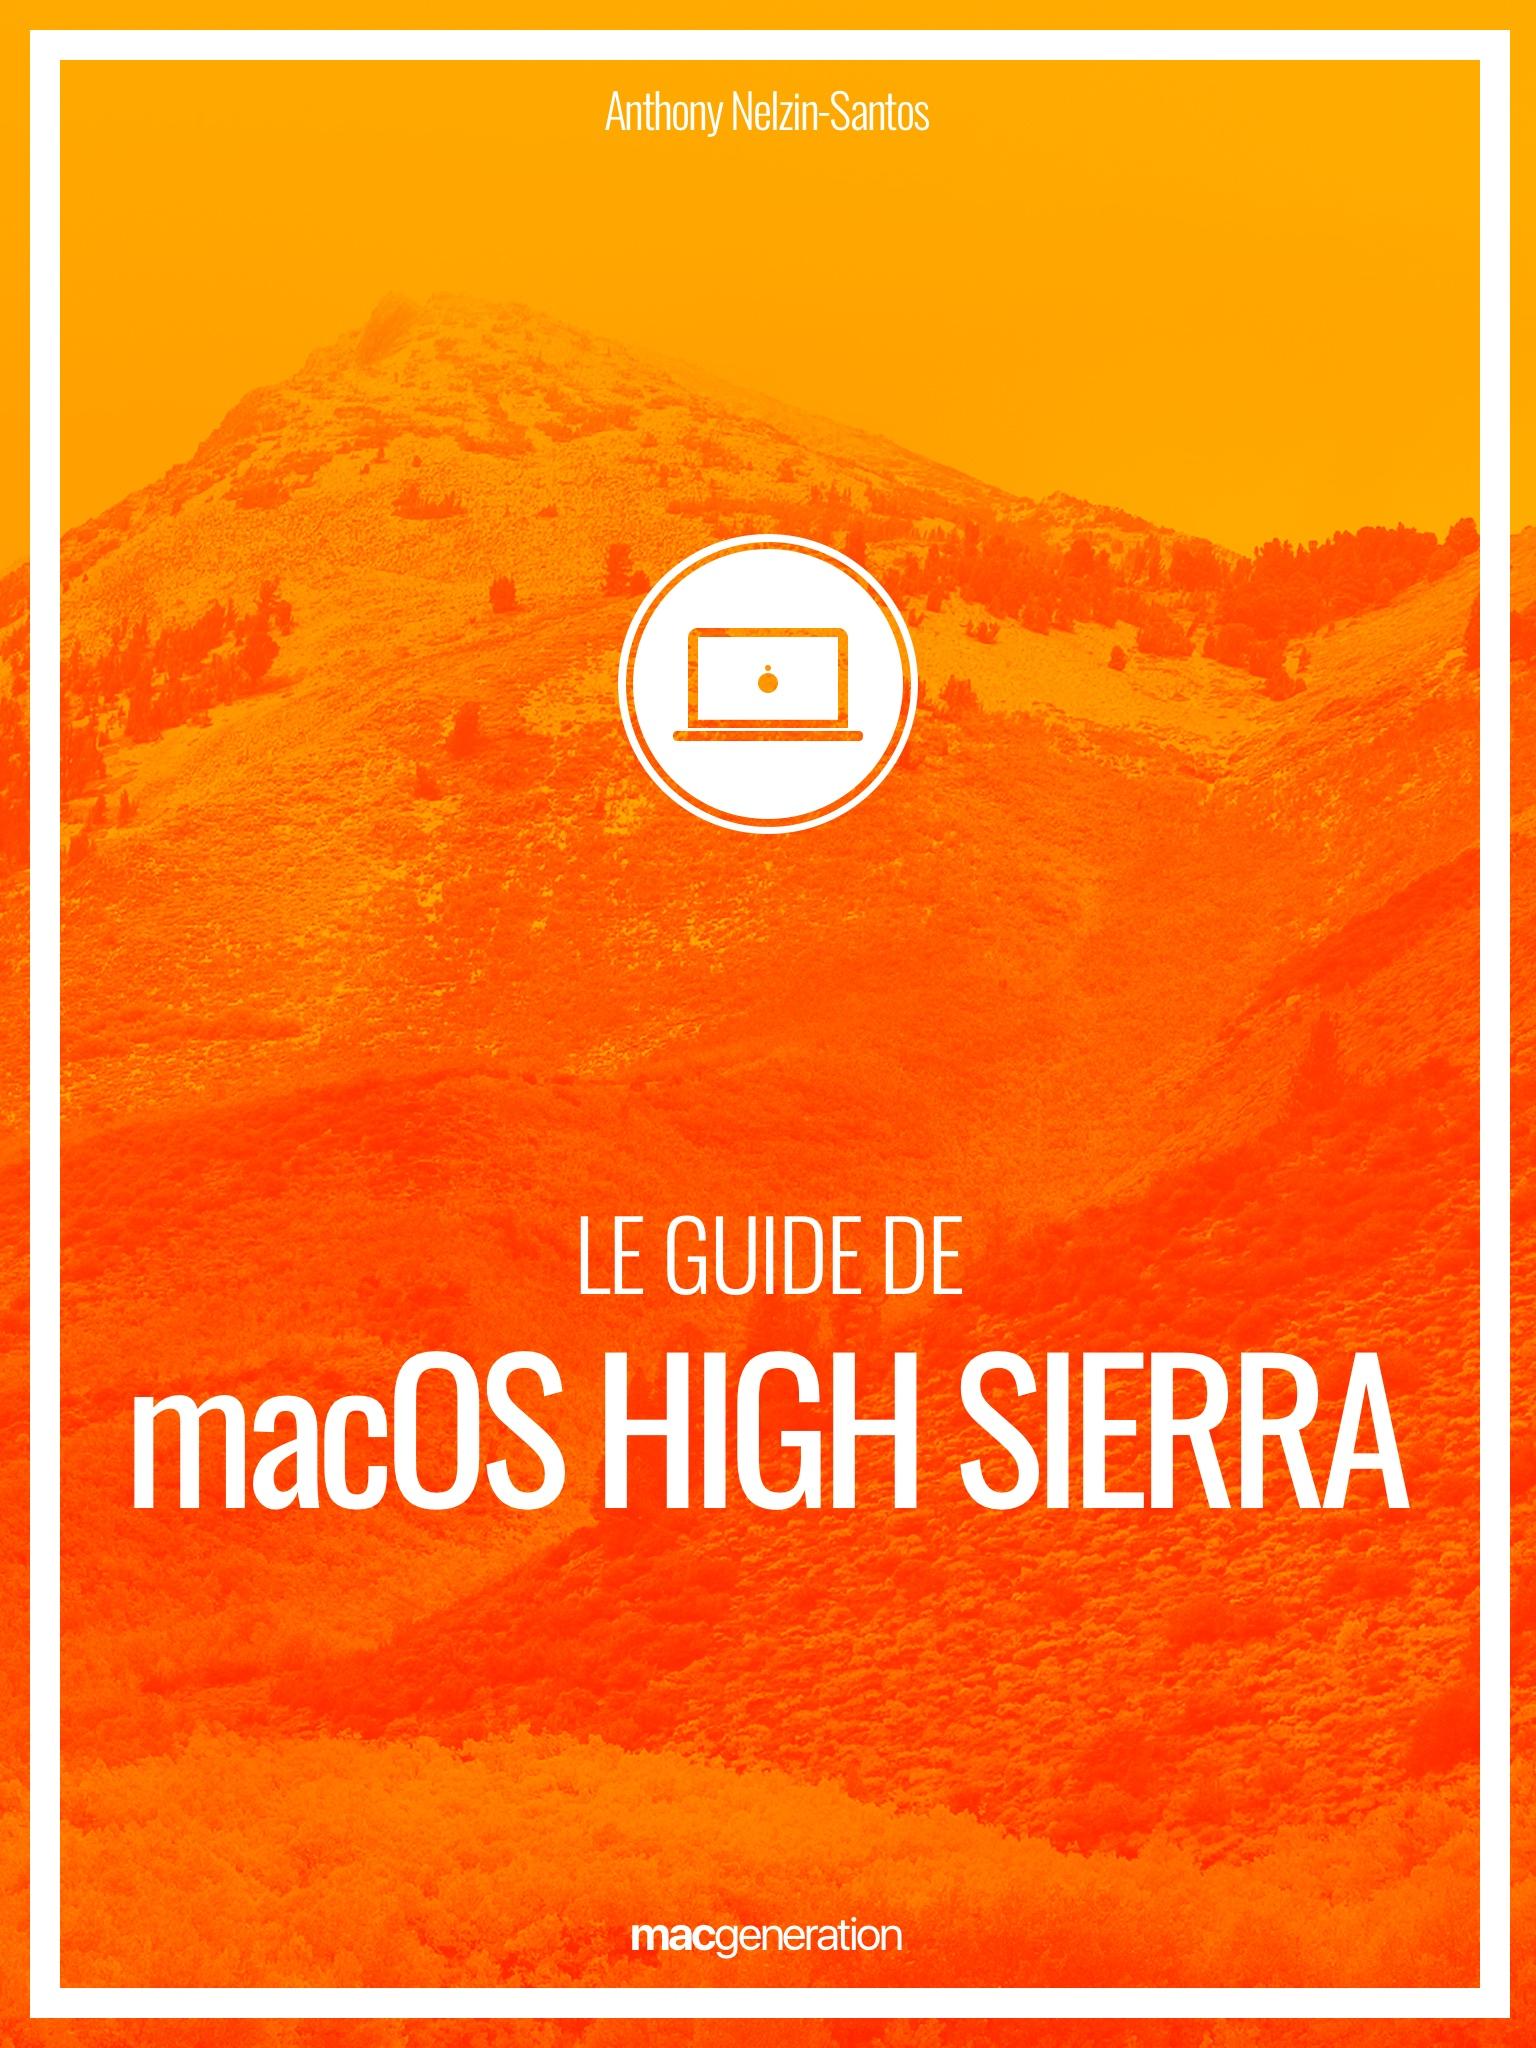 livres/mac-hs.jpg